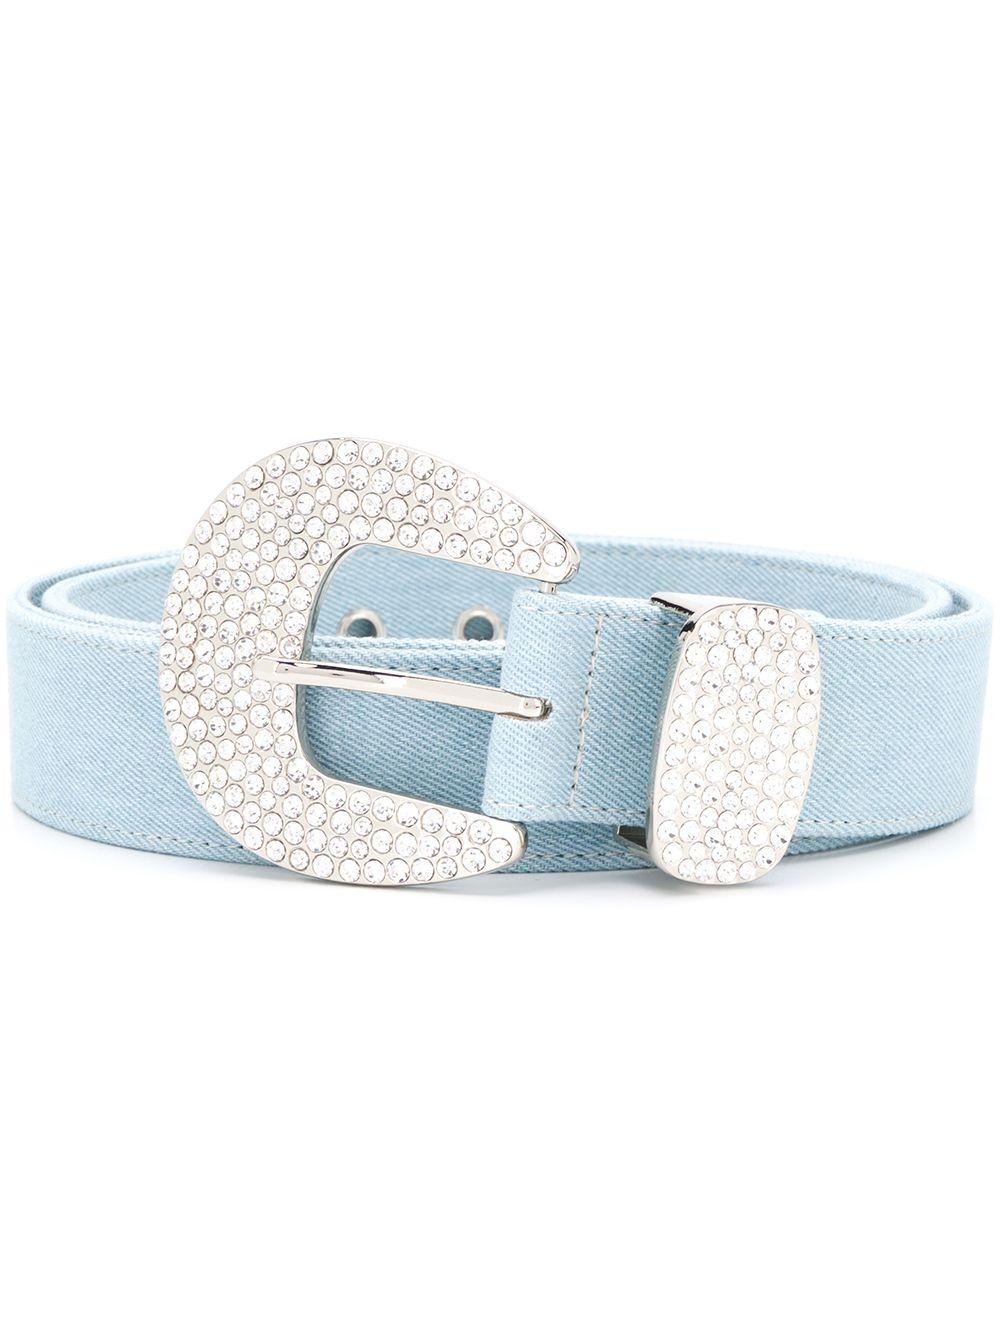 Brittany Belt